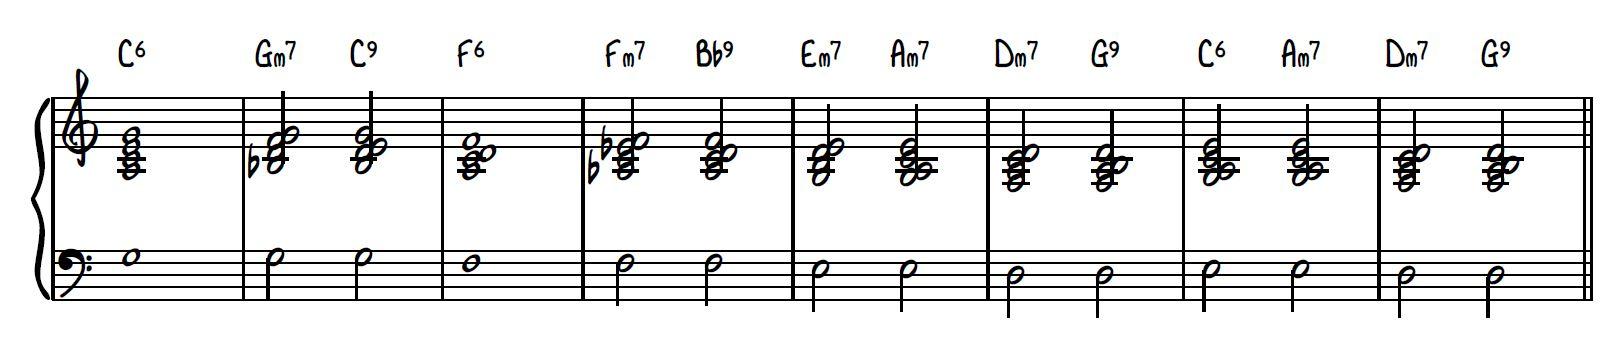 Block chord drop 2 piano voicing